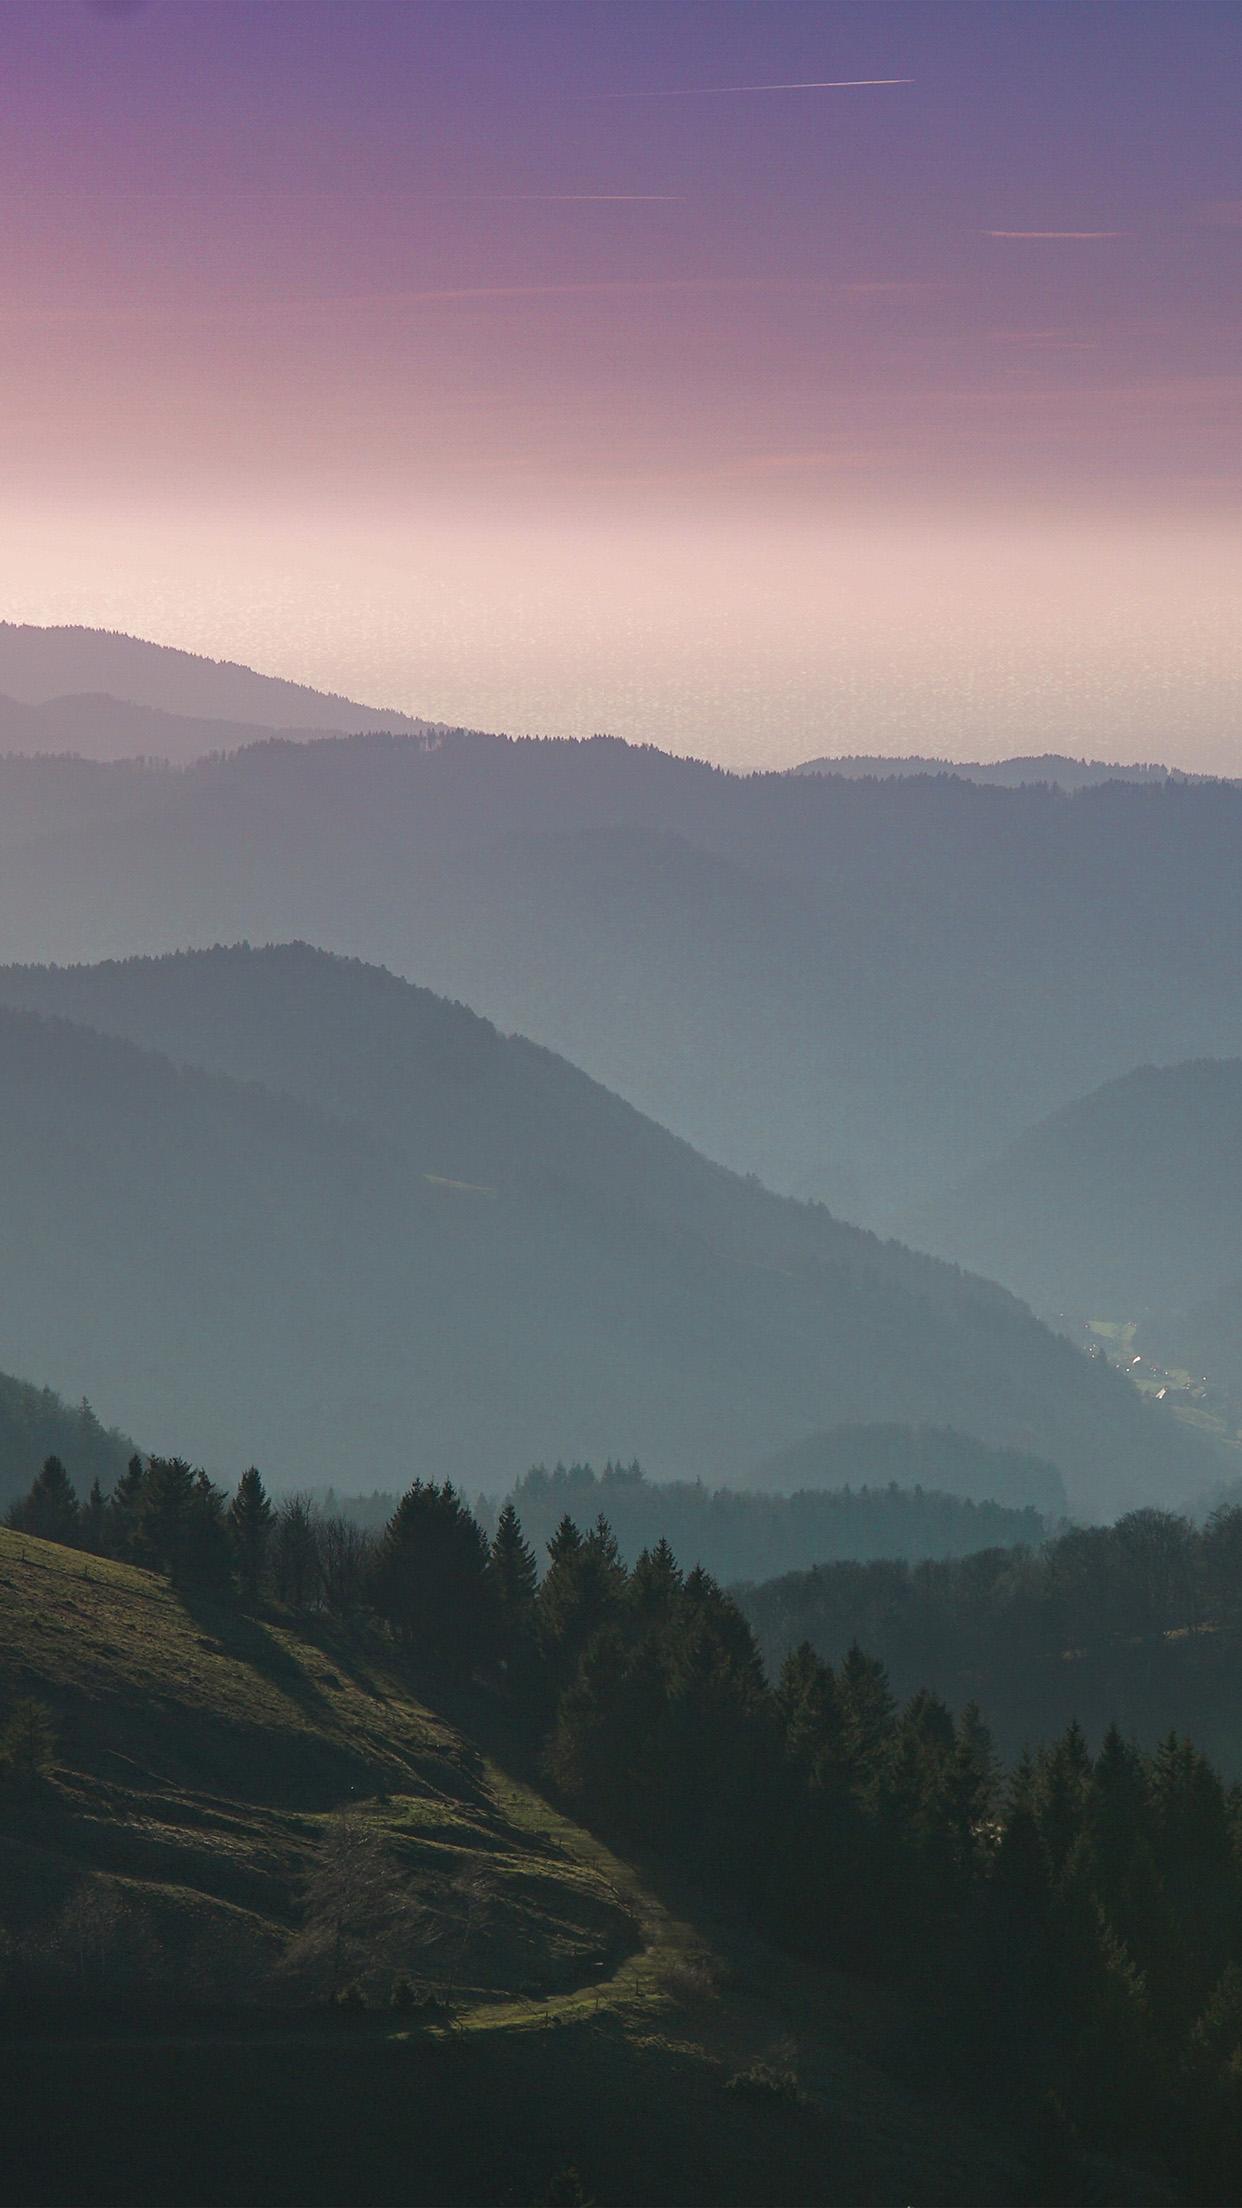 ne98-mountain-view-sky-purple-nature-wallpaper